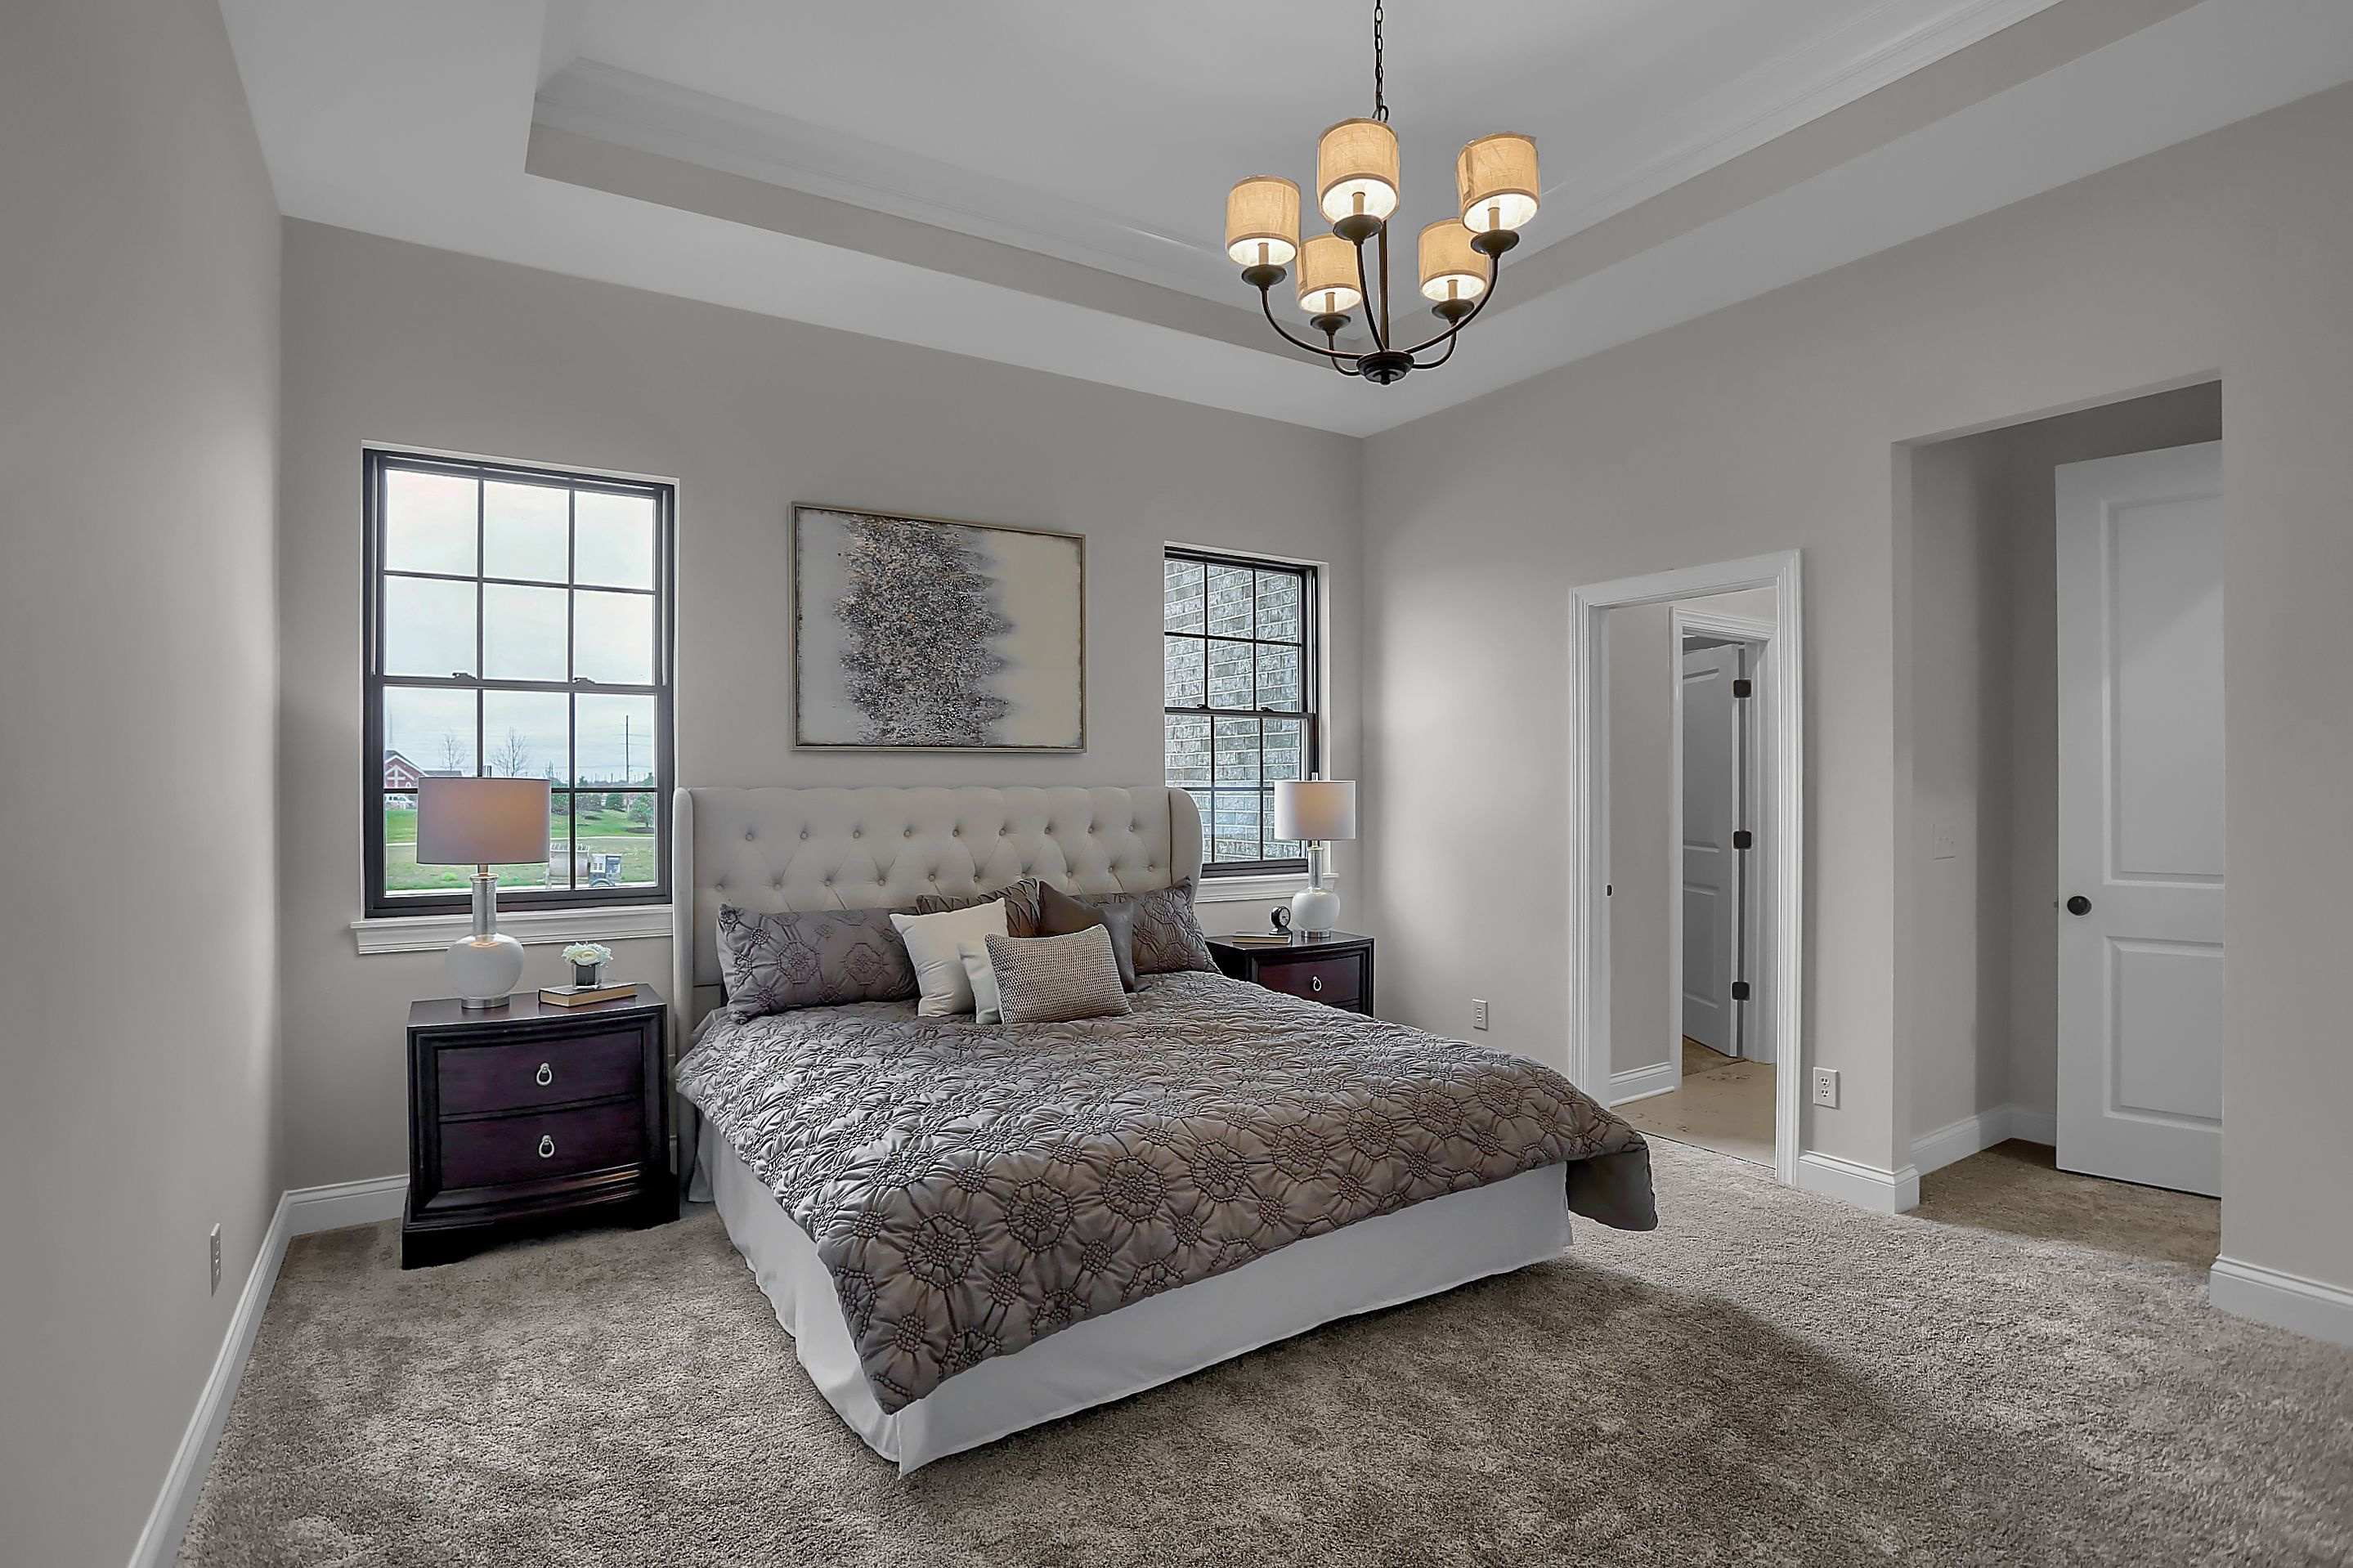 Bedroom featured in the Lockerbie 303 By Estridge Homes in Indianapolis, IN